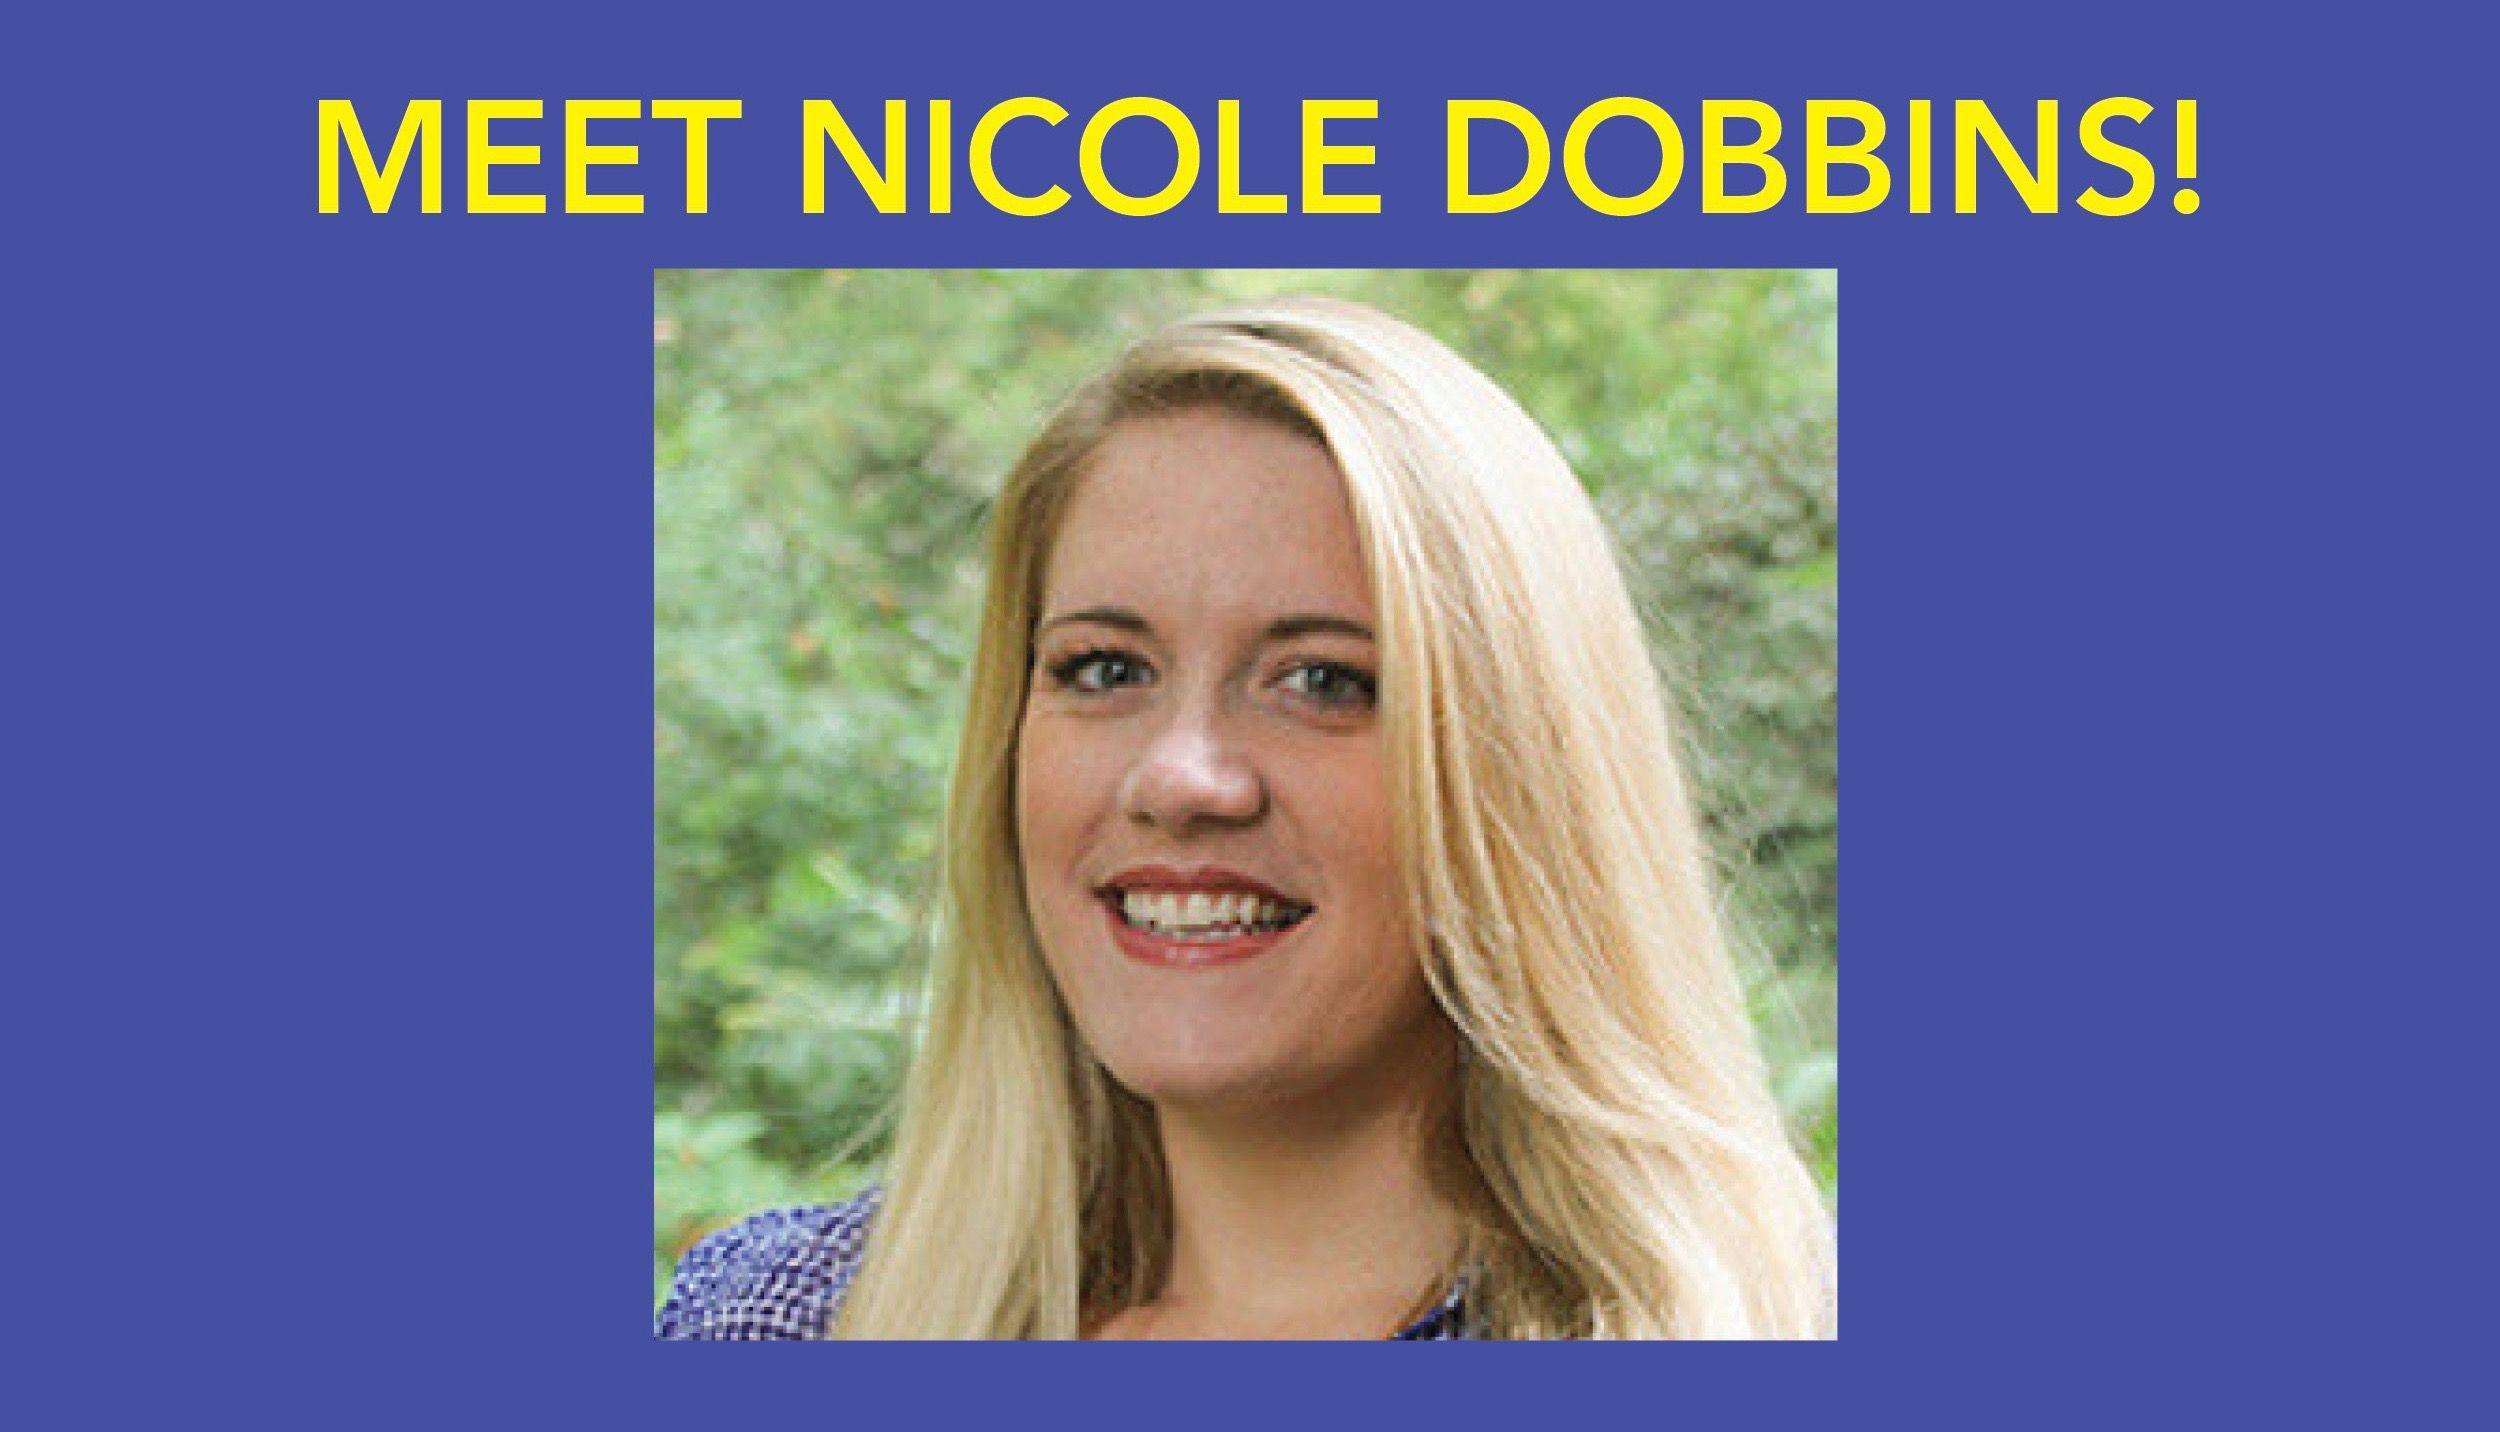 Meet Nicole Dobbins